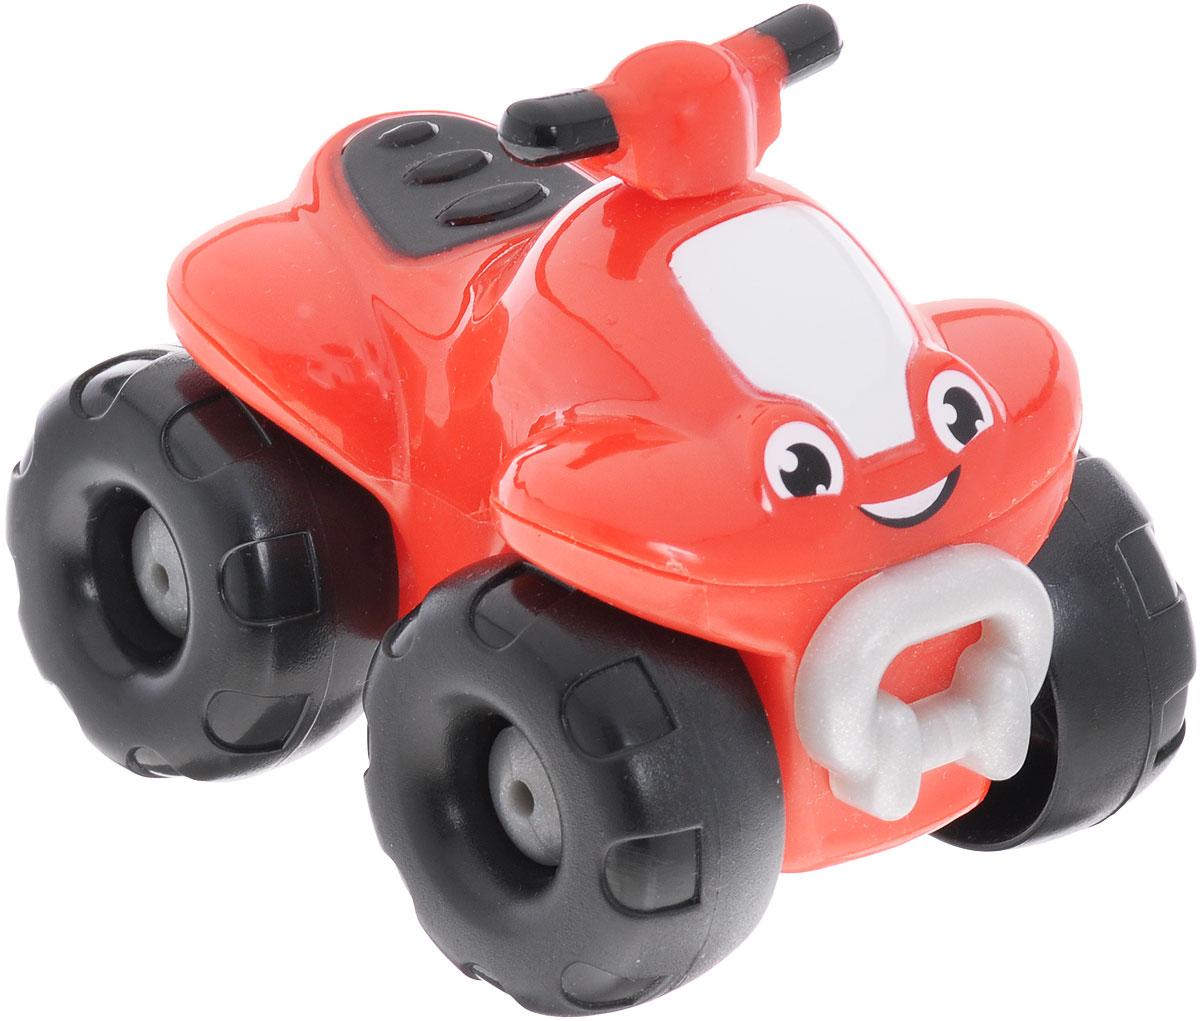 Smoby Квадроцикл Vroom Planet smoby пожарный грузовик vroom planet smoby